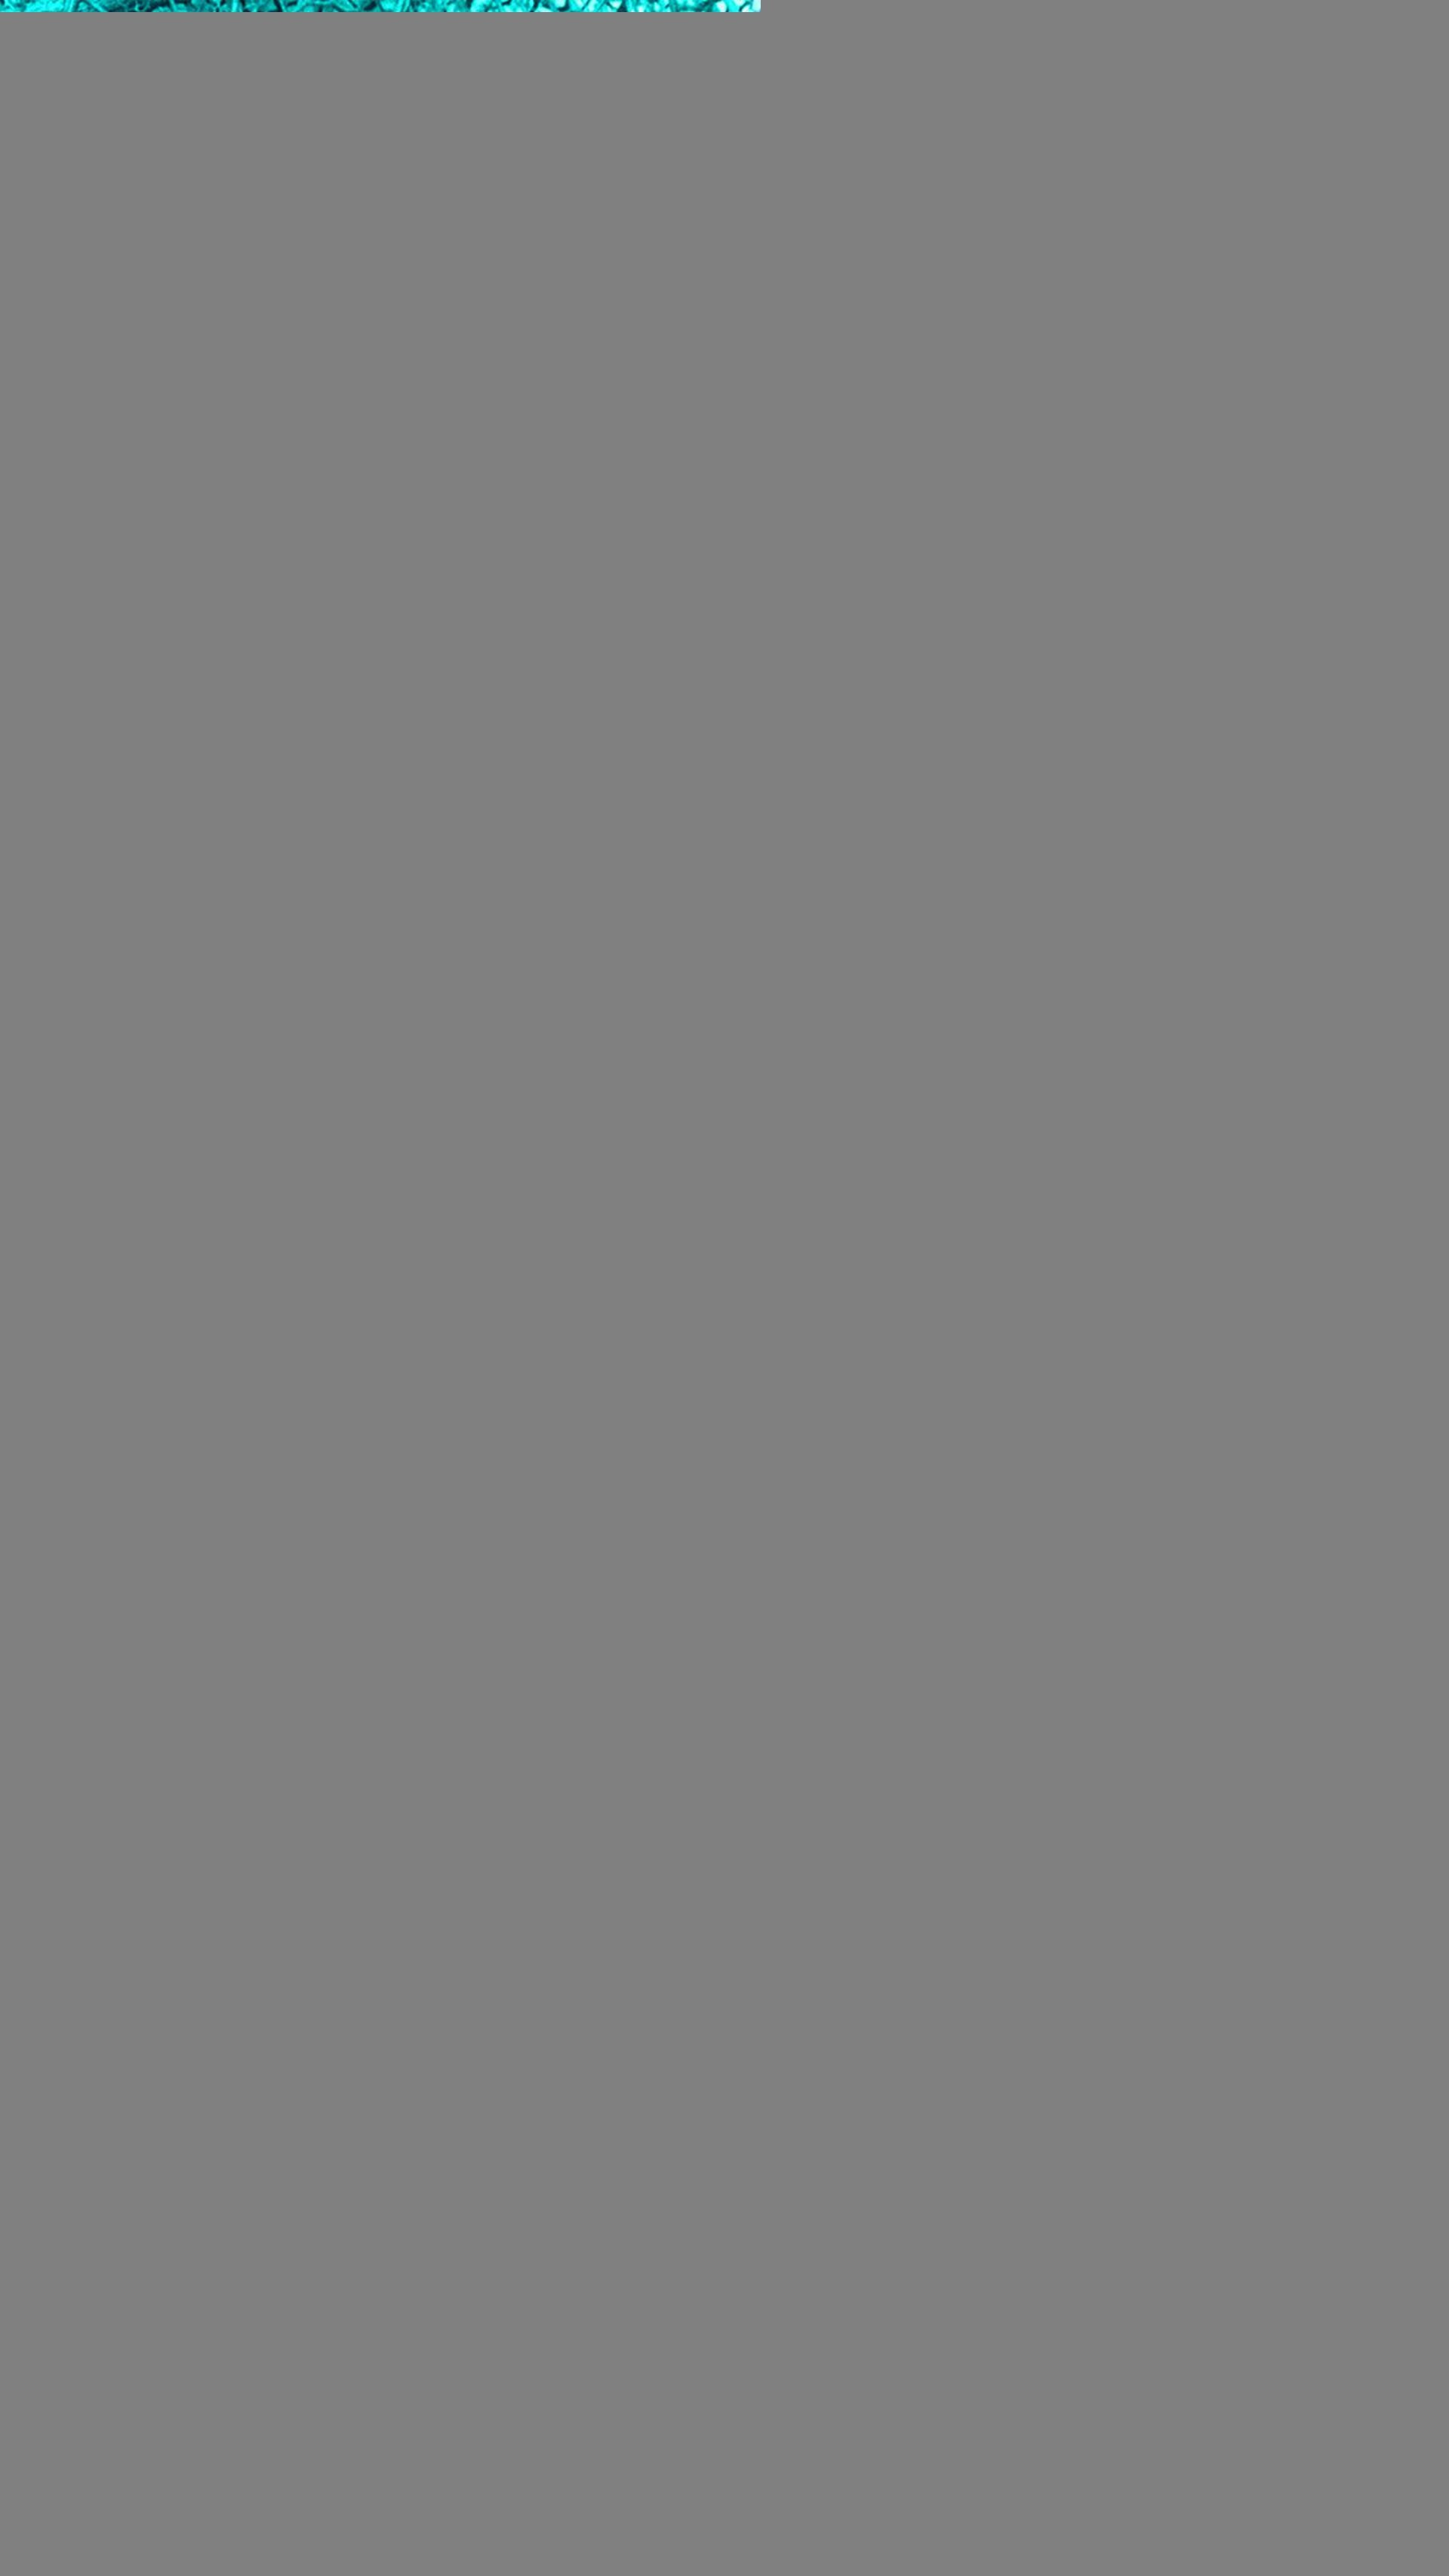 1080x1920 Ios 8 Wallpaper Hd Iphone 6 Plus Details